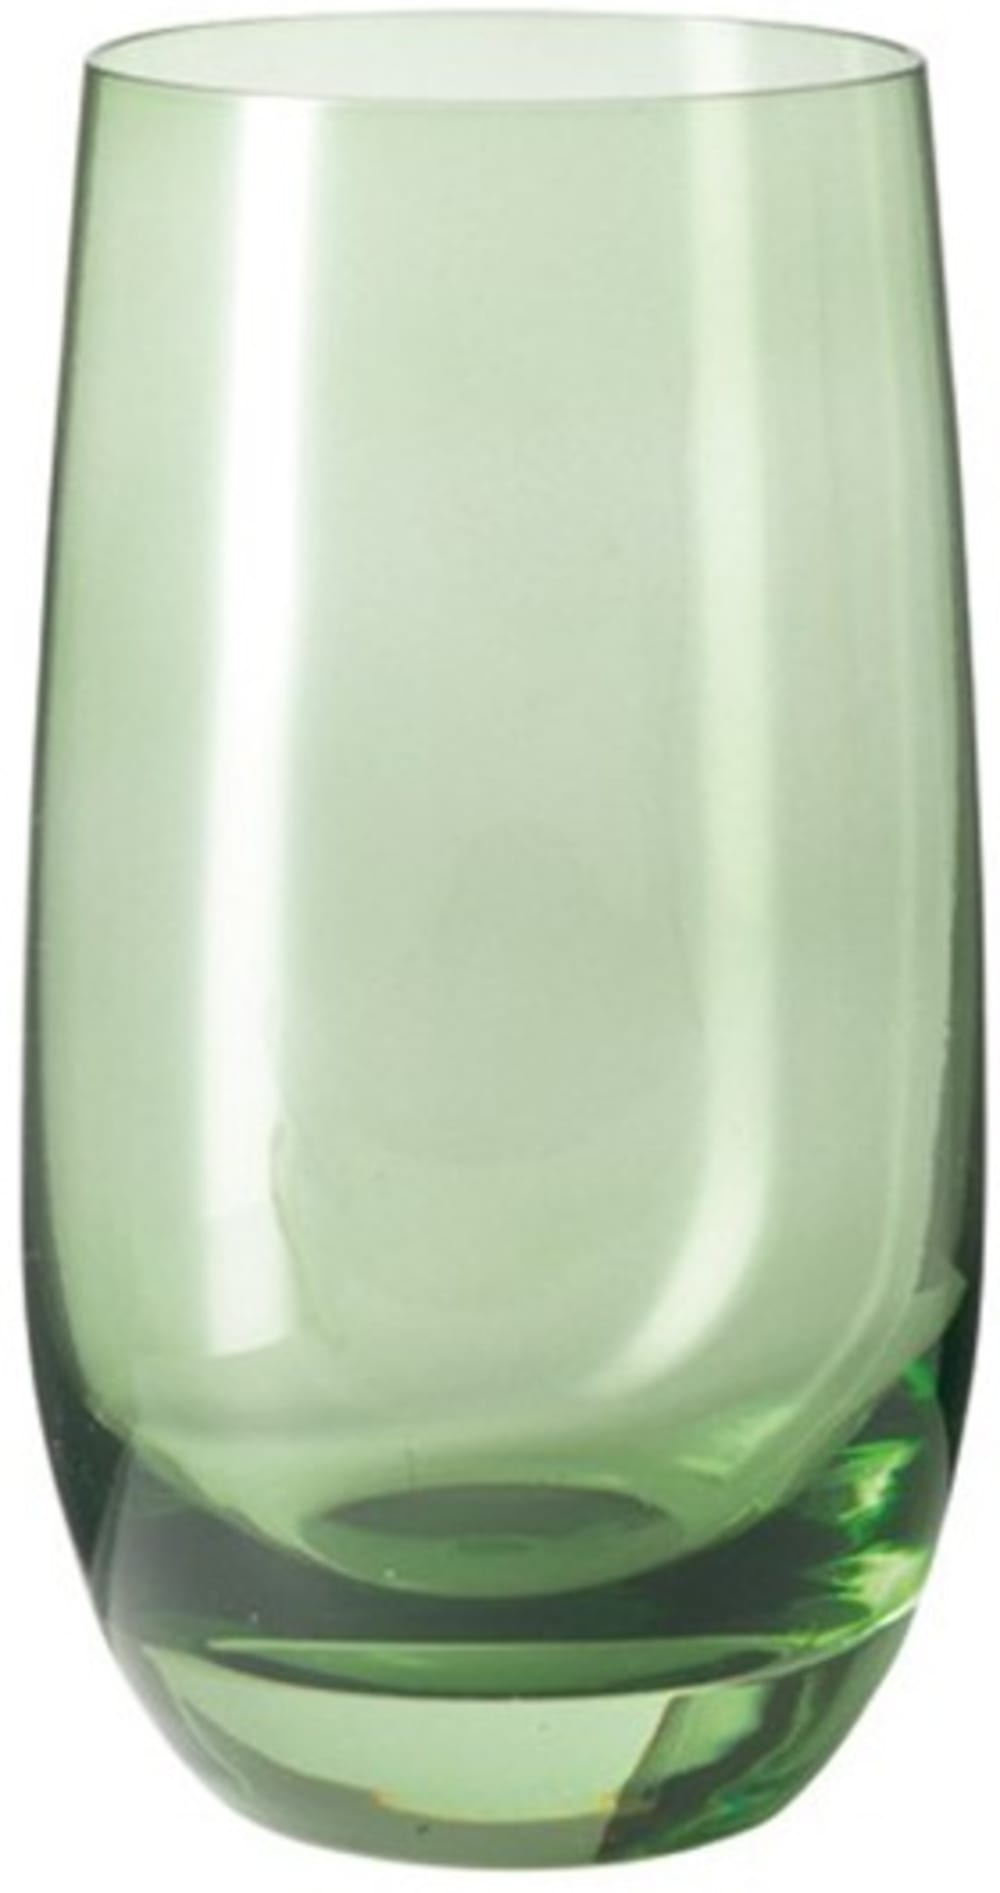 LO - Szklanka 390 ml, zielona, COLORI